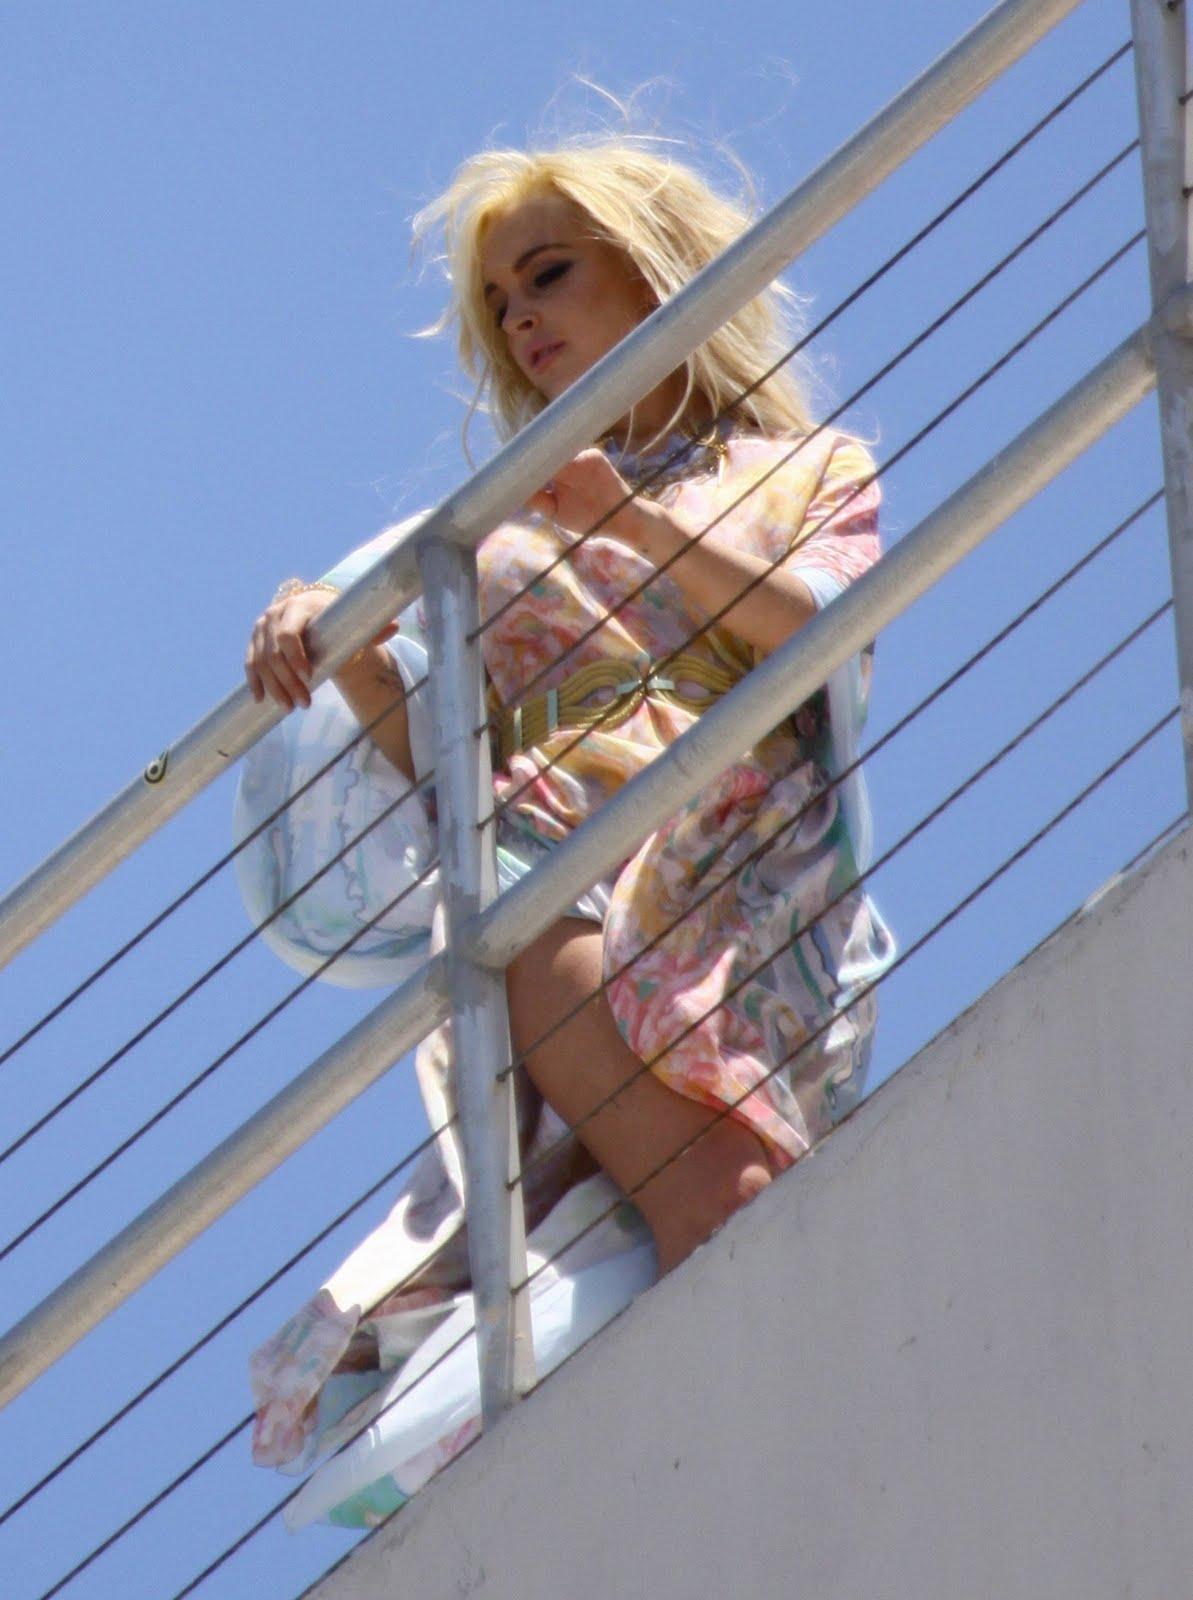 Windy Upskirt Lindsay Lohan